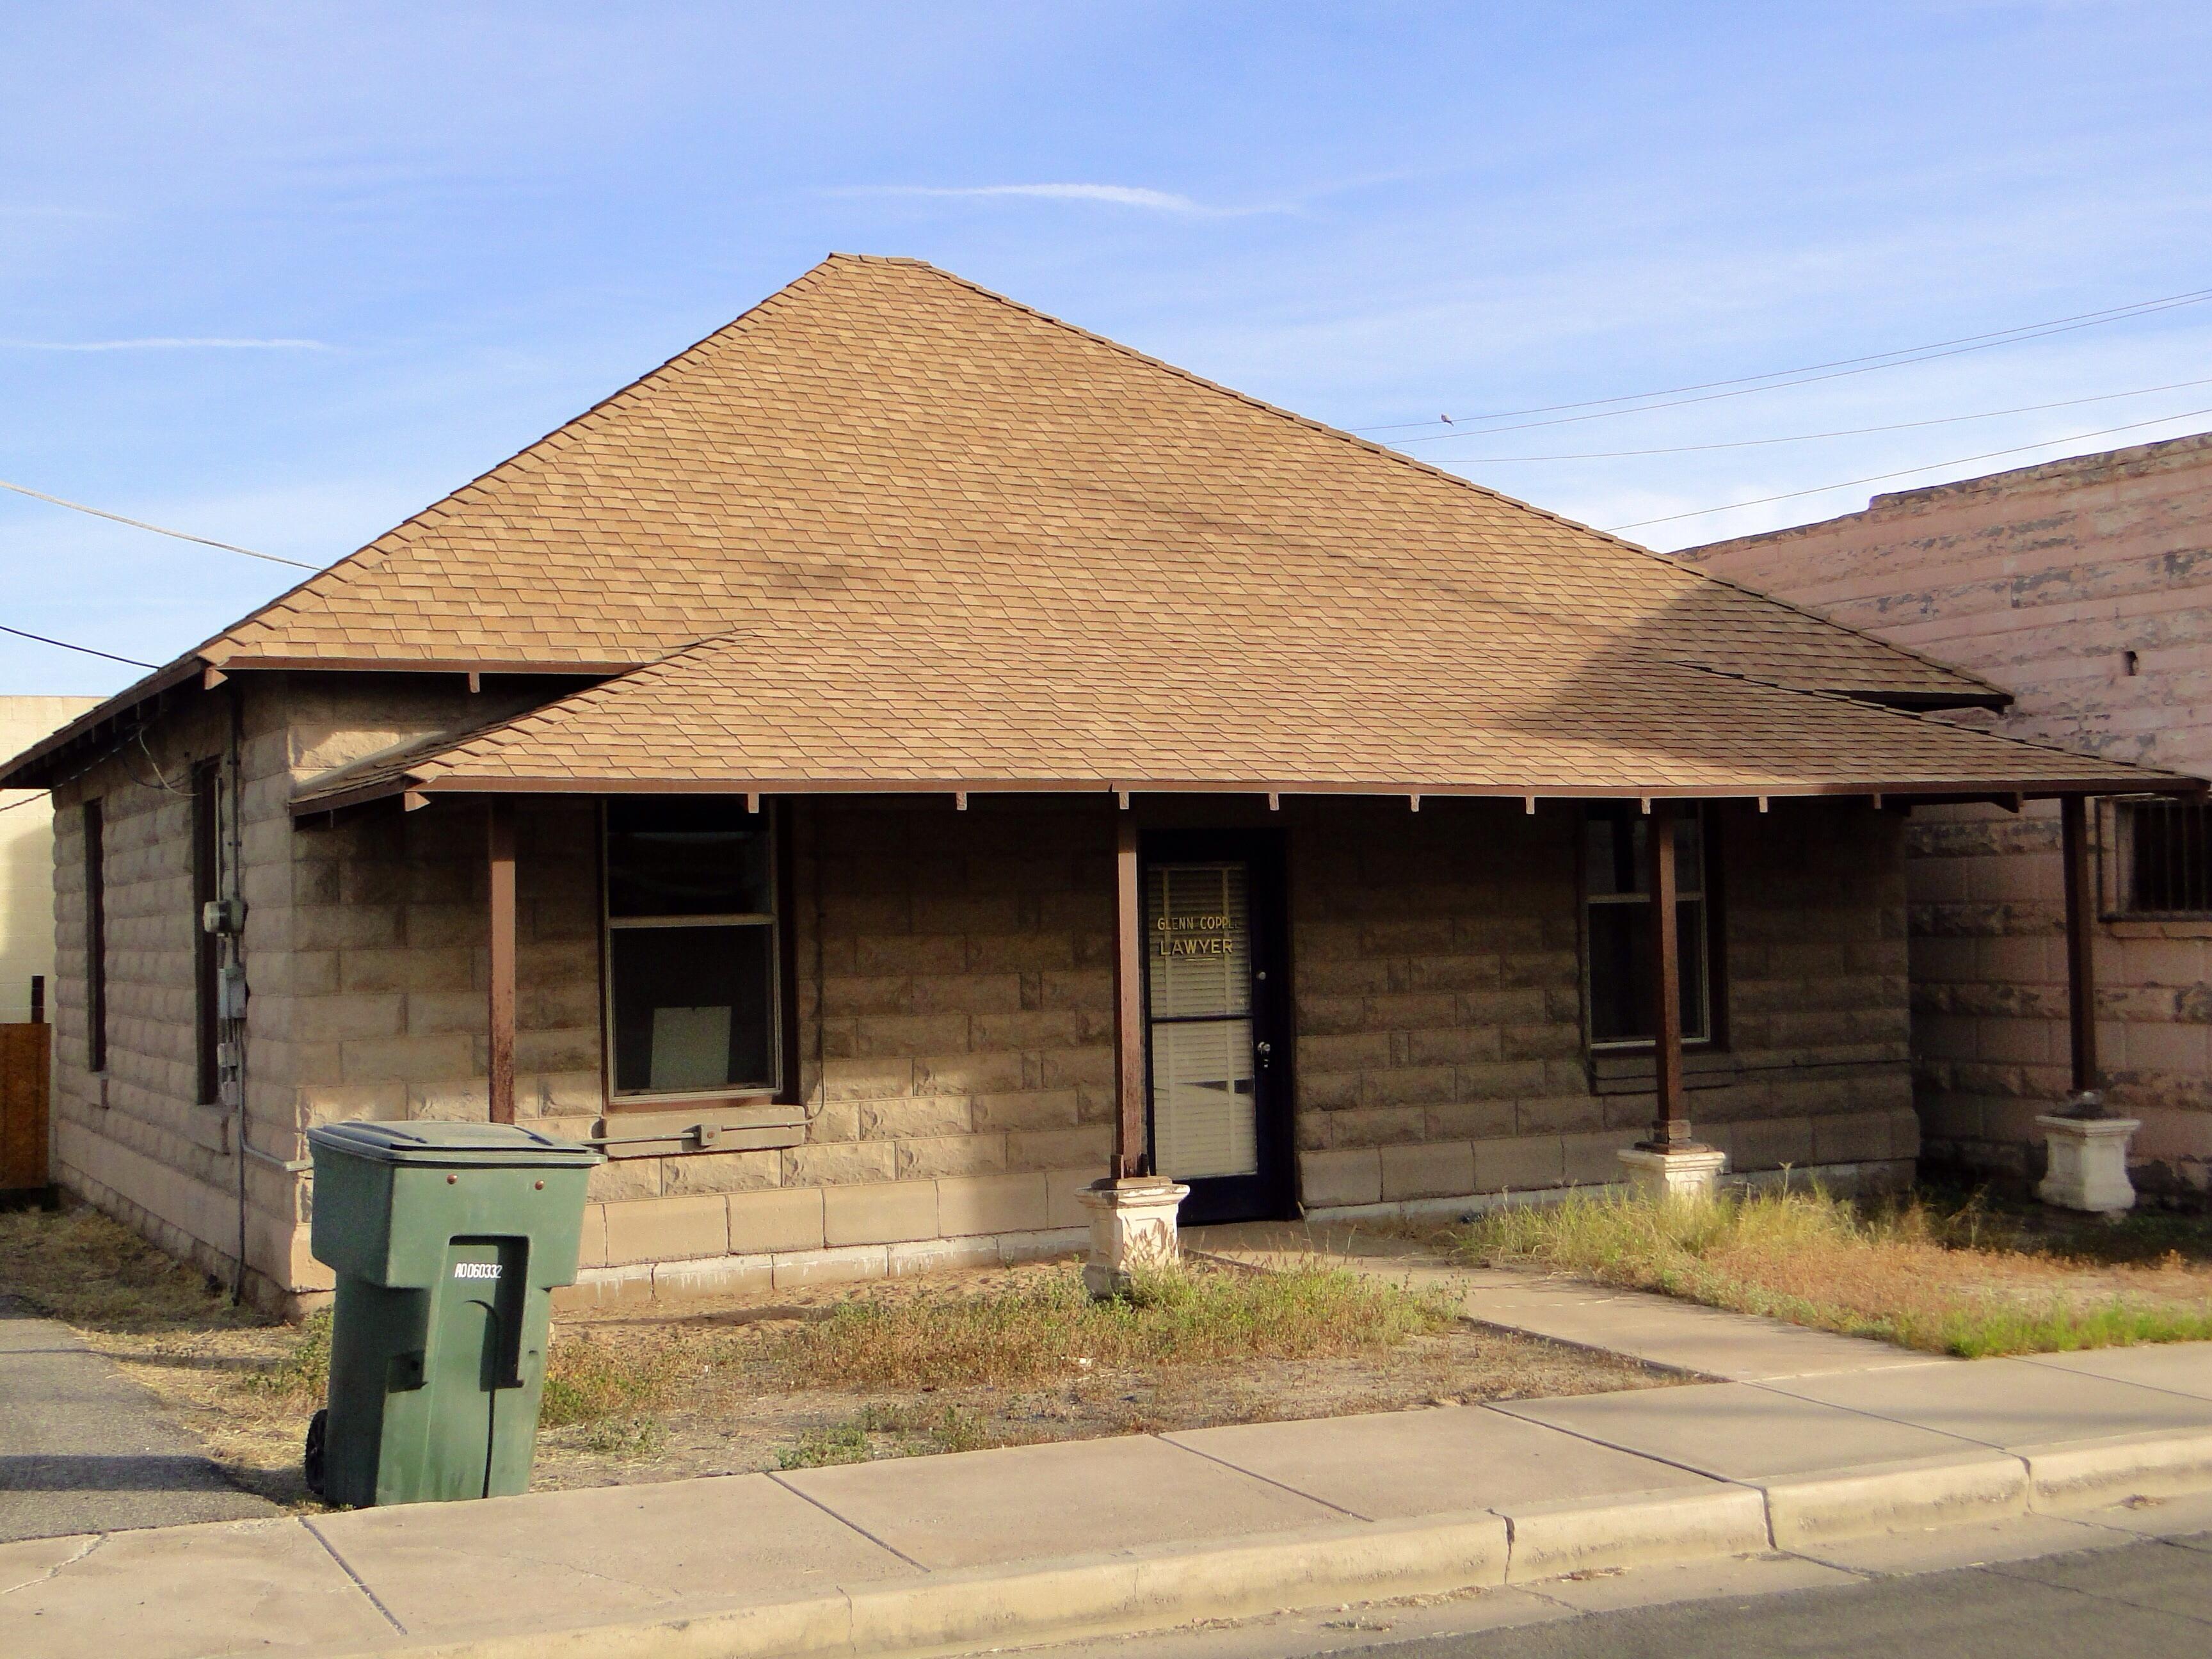 Yuma Az Property Records